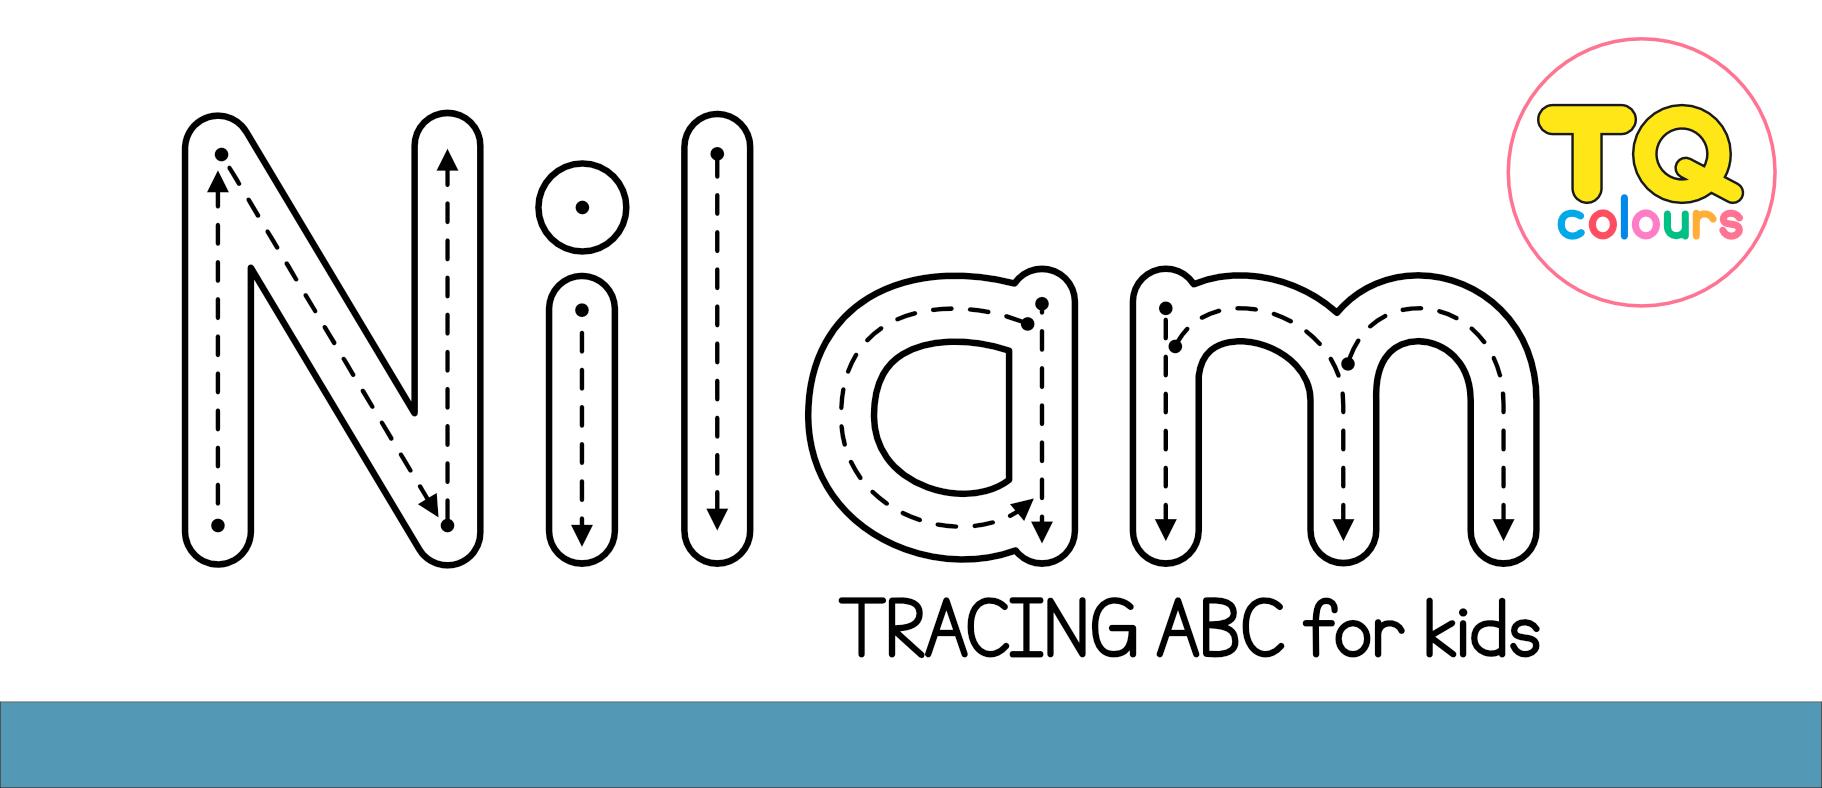 Nilam Tracing Abc Font - 1001 Free Fonts